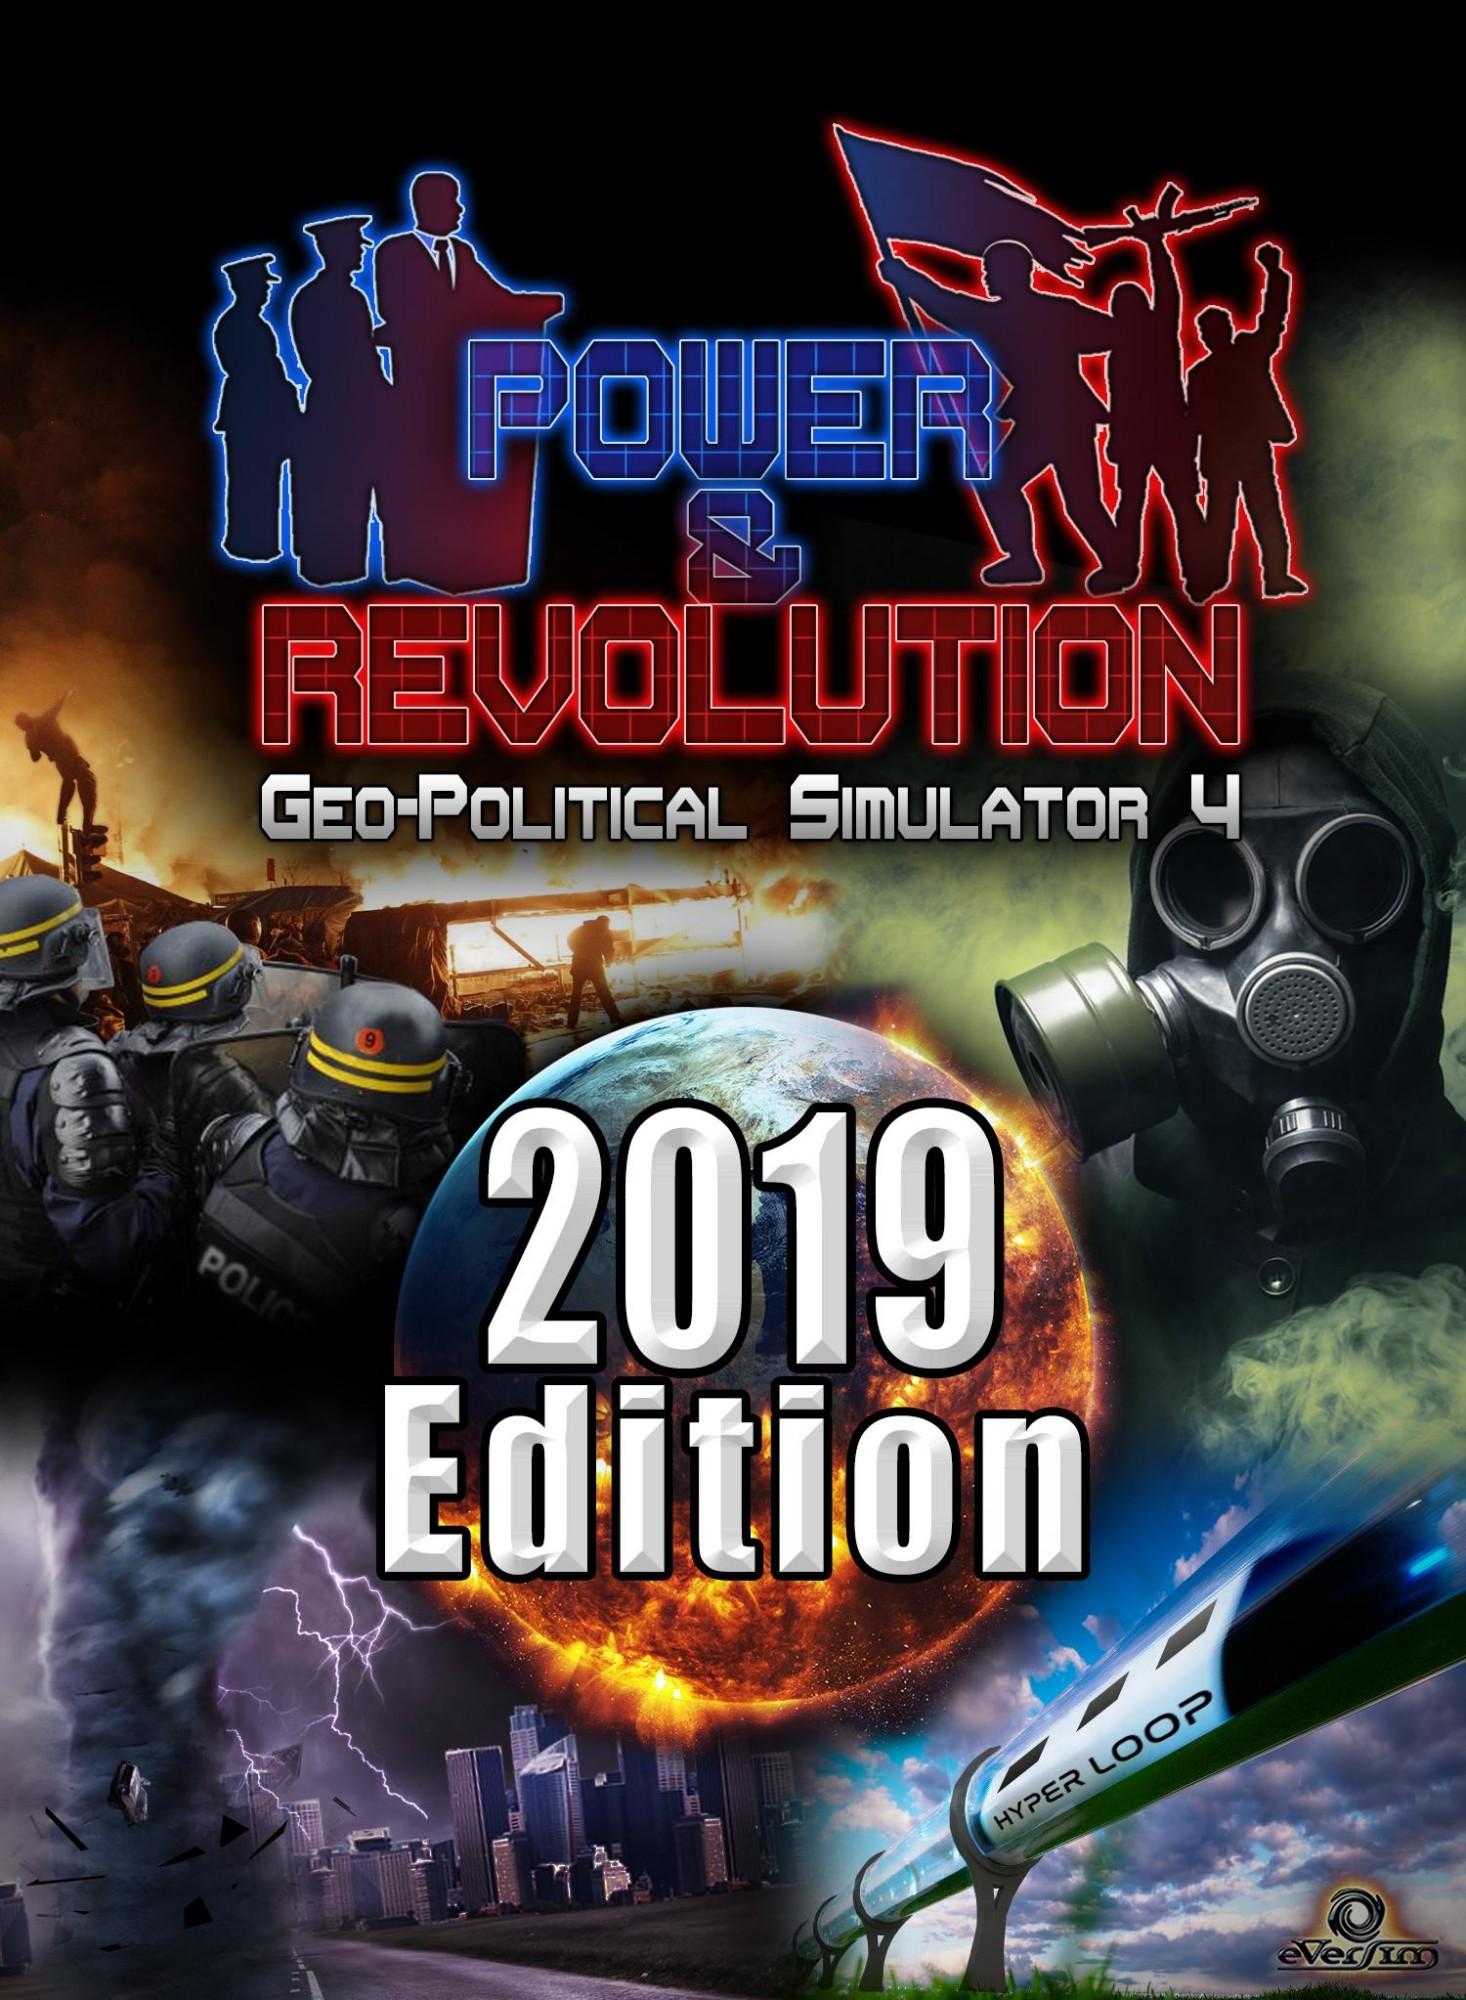 Nexway Power & Revolution 2019 Complete Edition vídeo juego PC Inglés